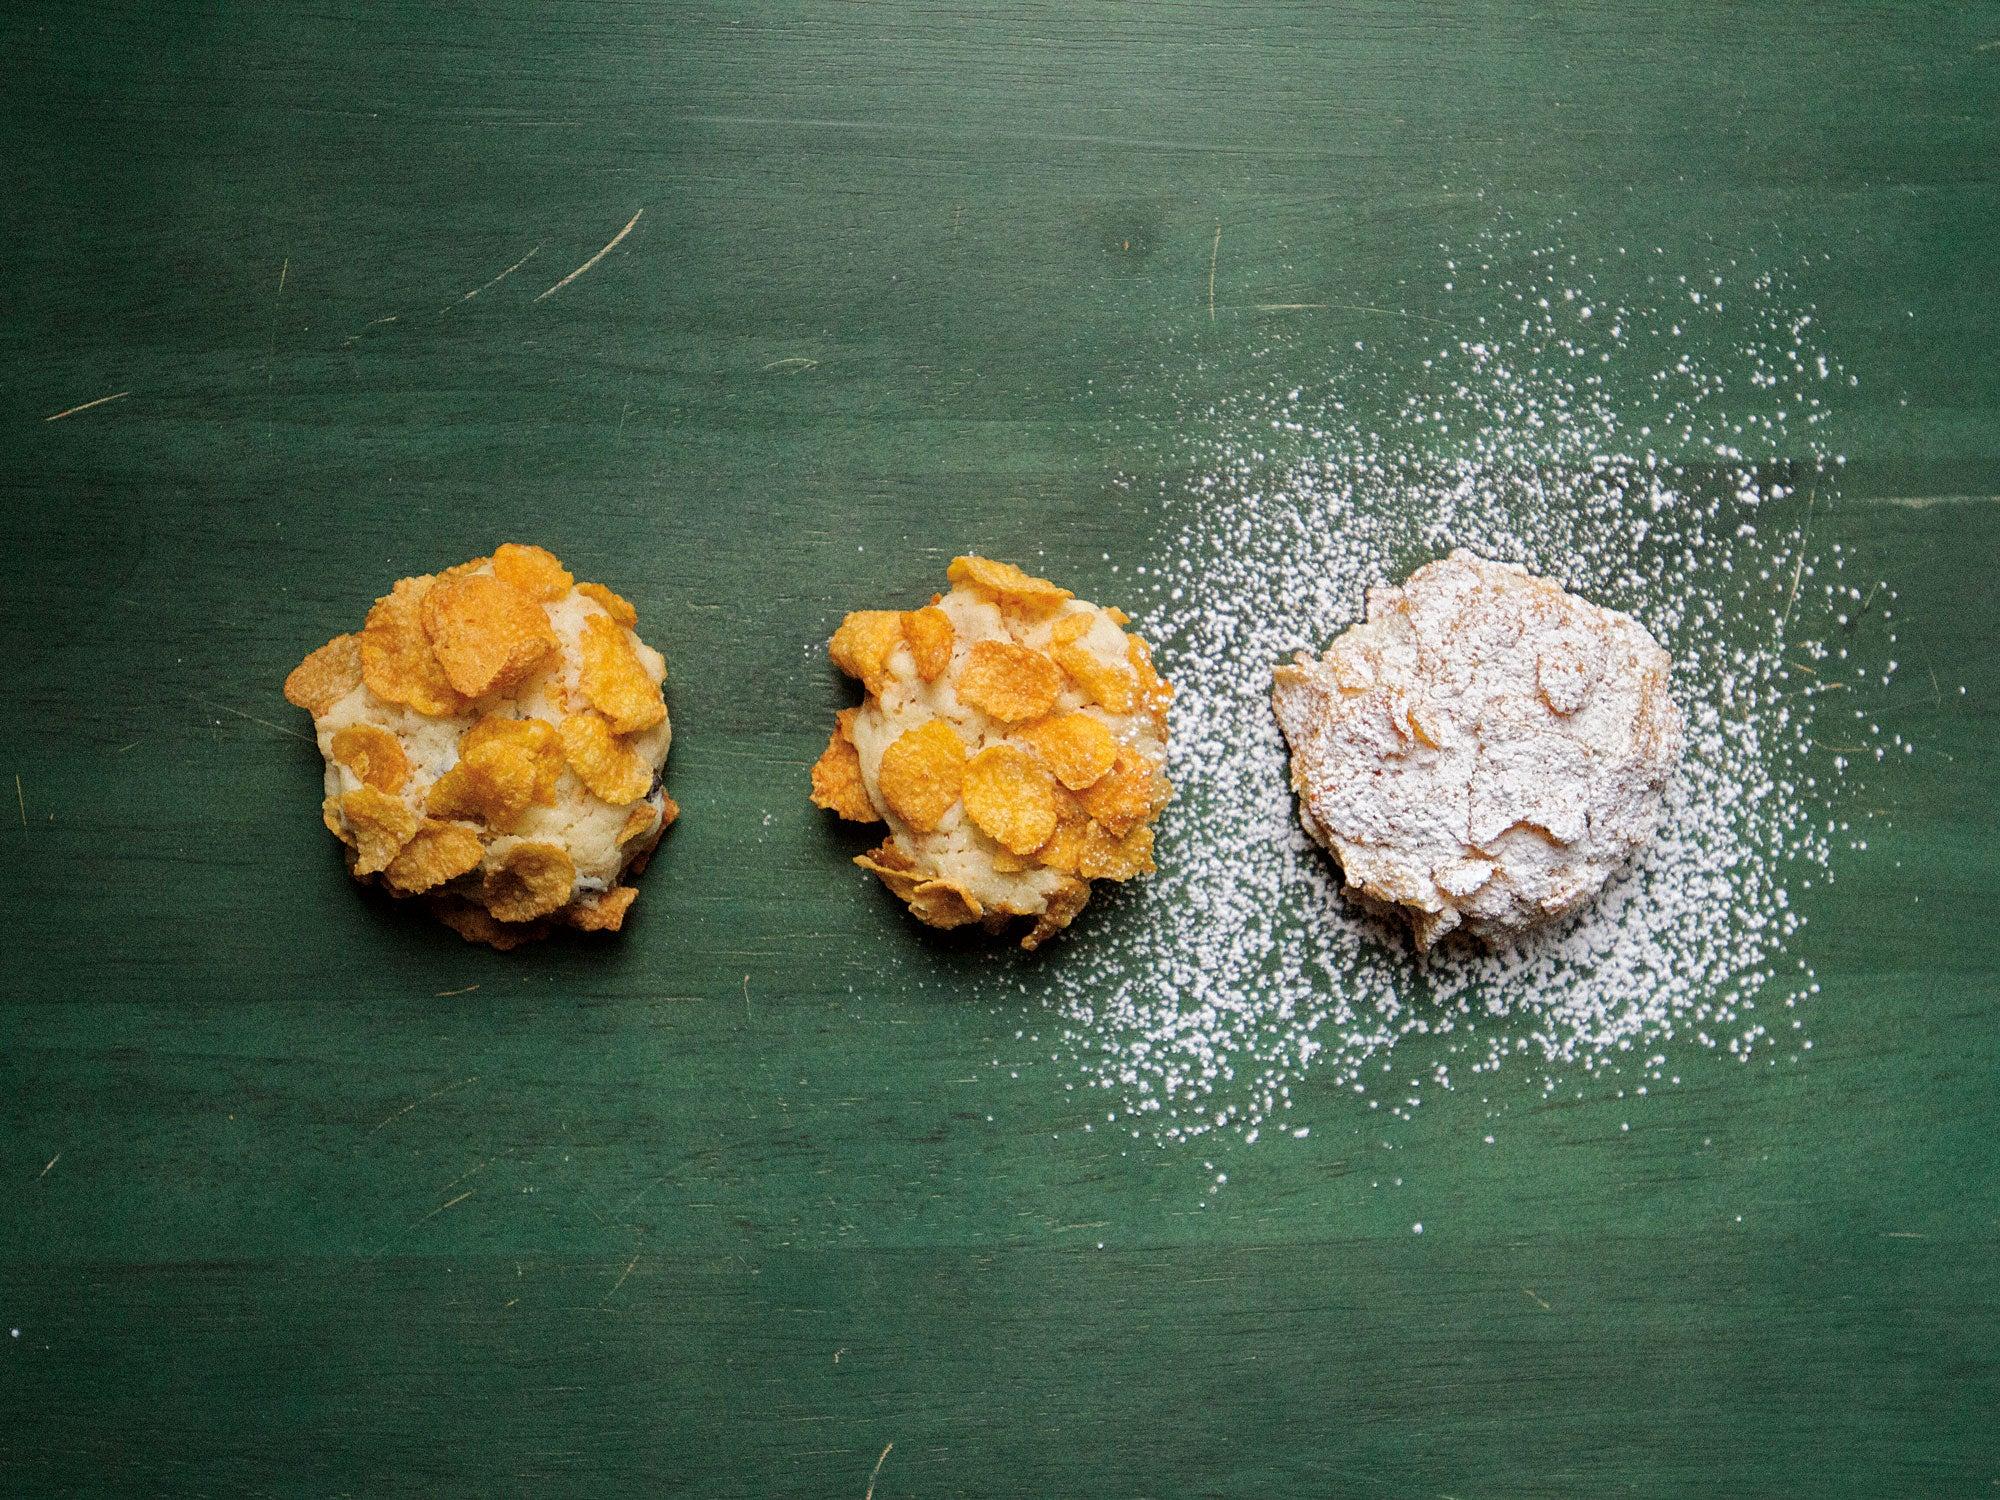 Umbrian Snowflake Cookies (Biscotti ai Cereali)